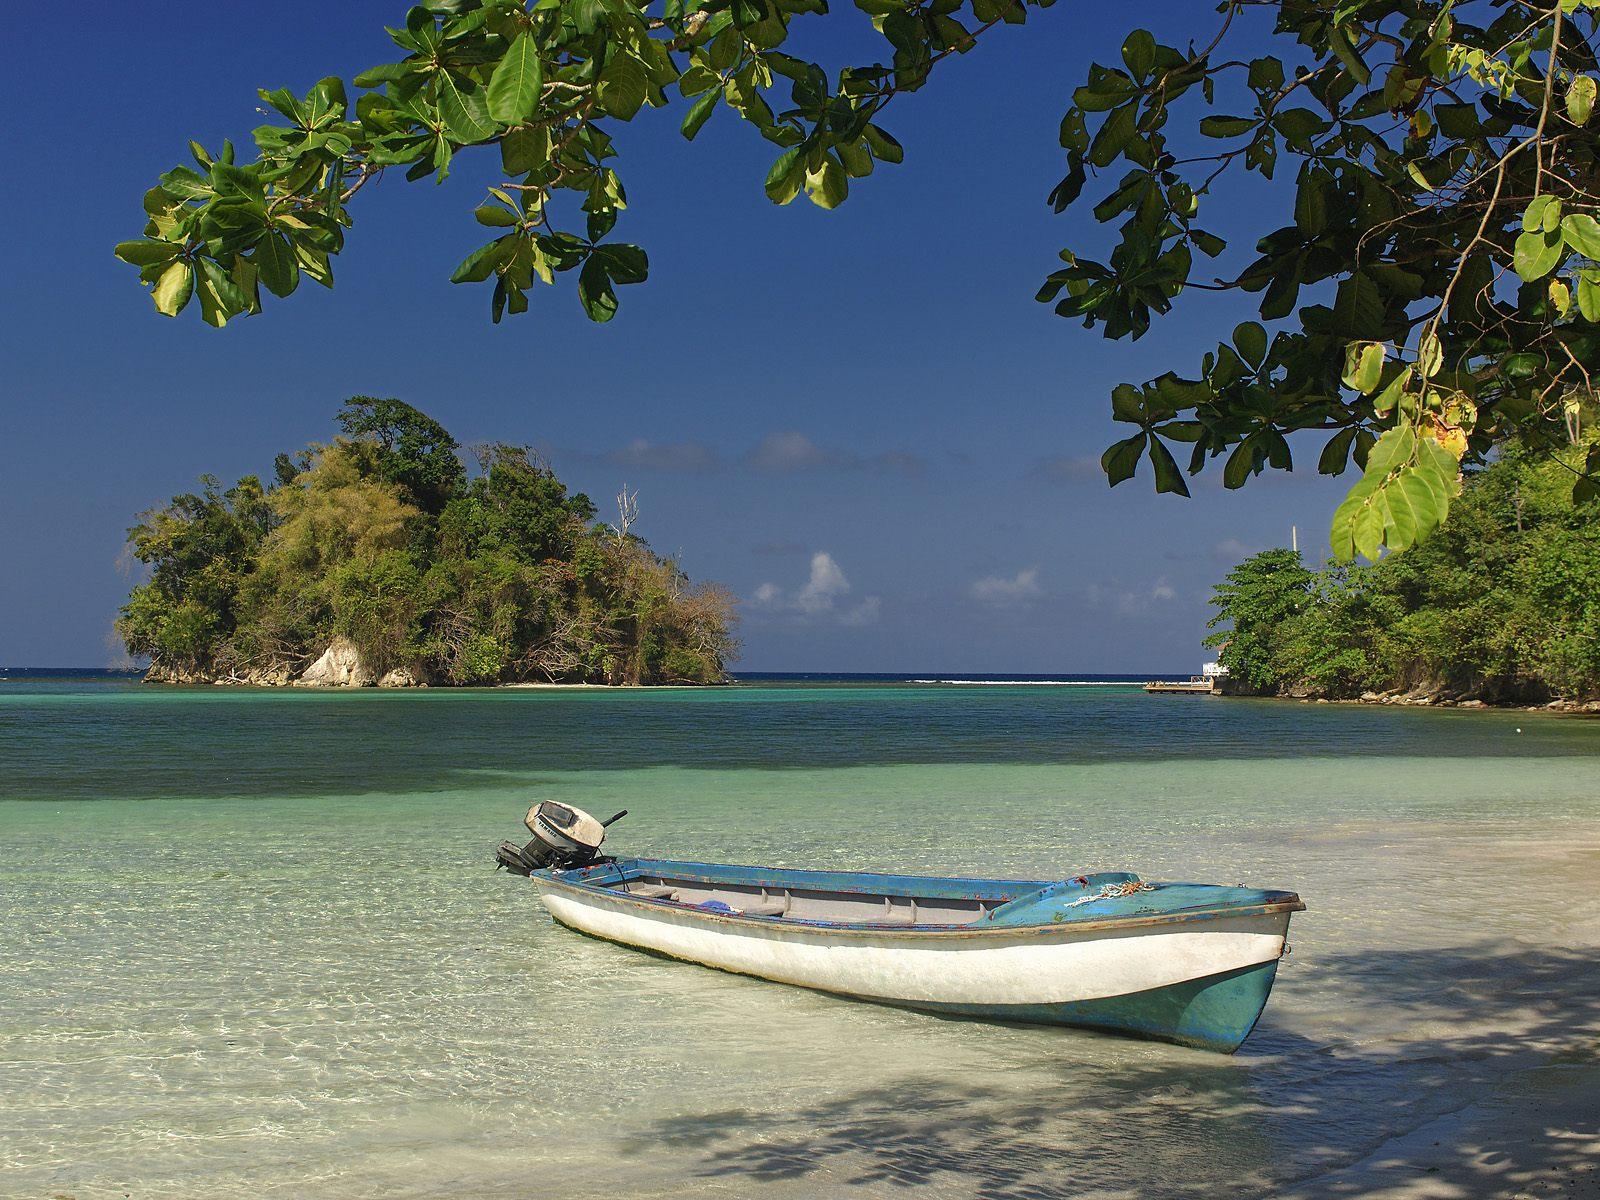 http://3.bp.blogspot.com/-RYng95m0eY0/UH9S_SnBljI/AAAAAAAACG8/Mf52u67HwIU/s1600/Canoa+a+la+orilla+del+mar+en+el+agua+cristalina,+en+la+playa.jpg